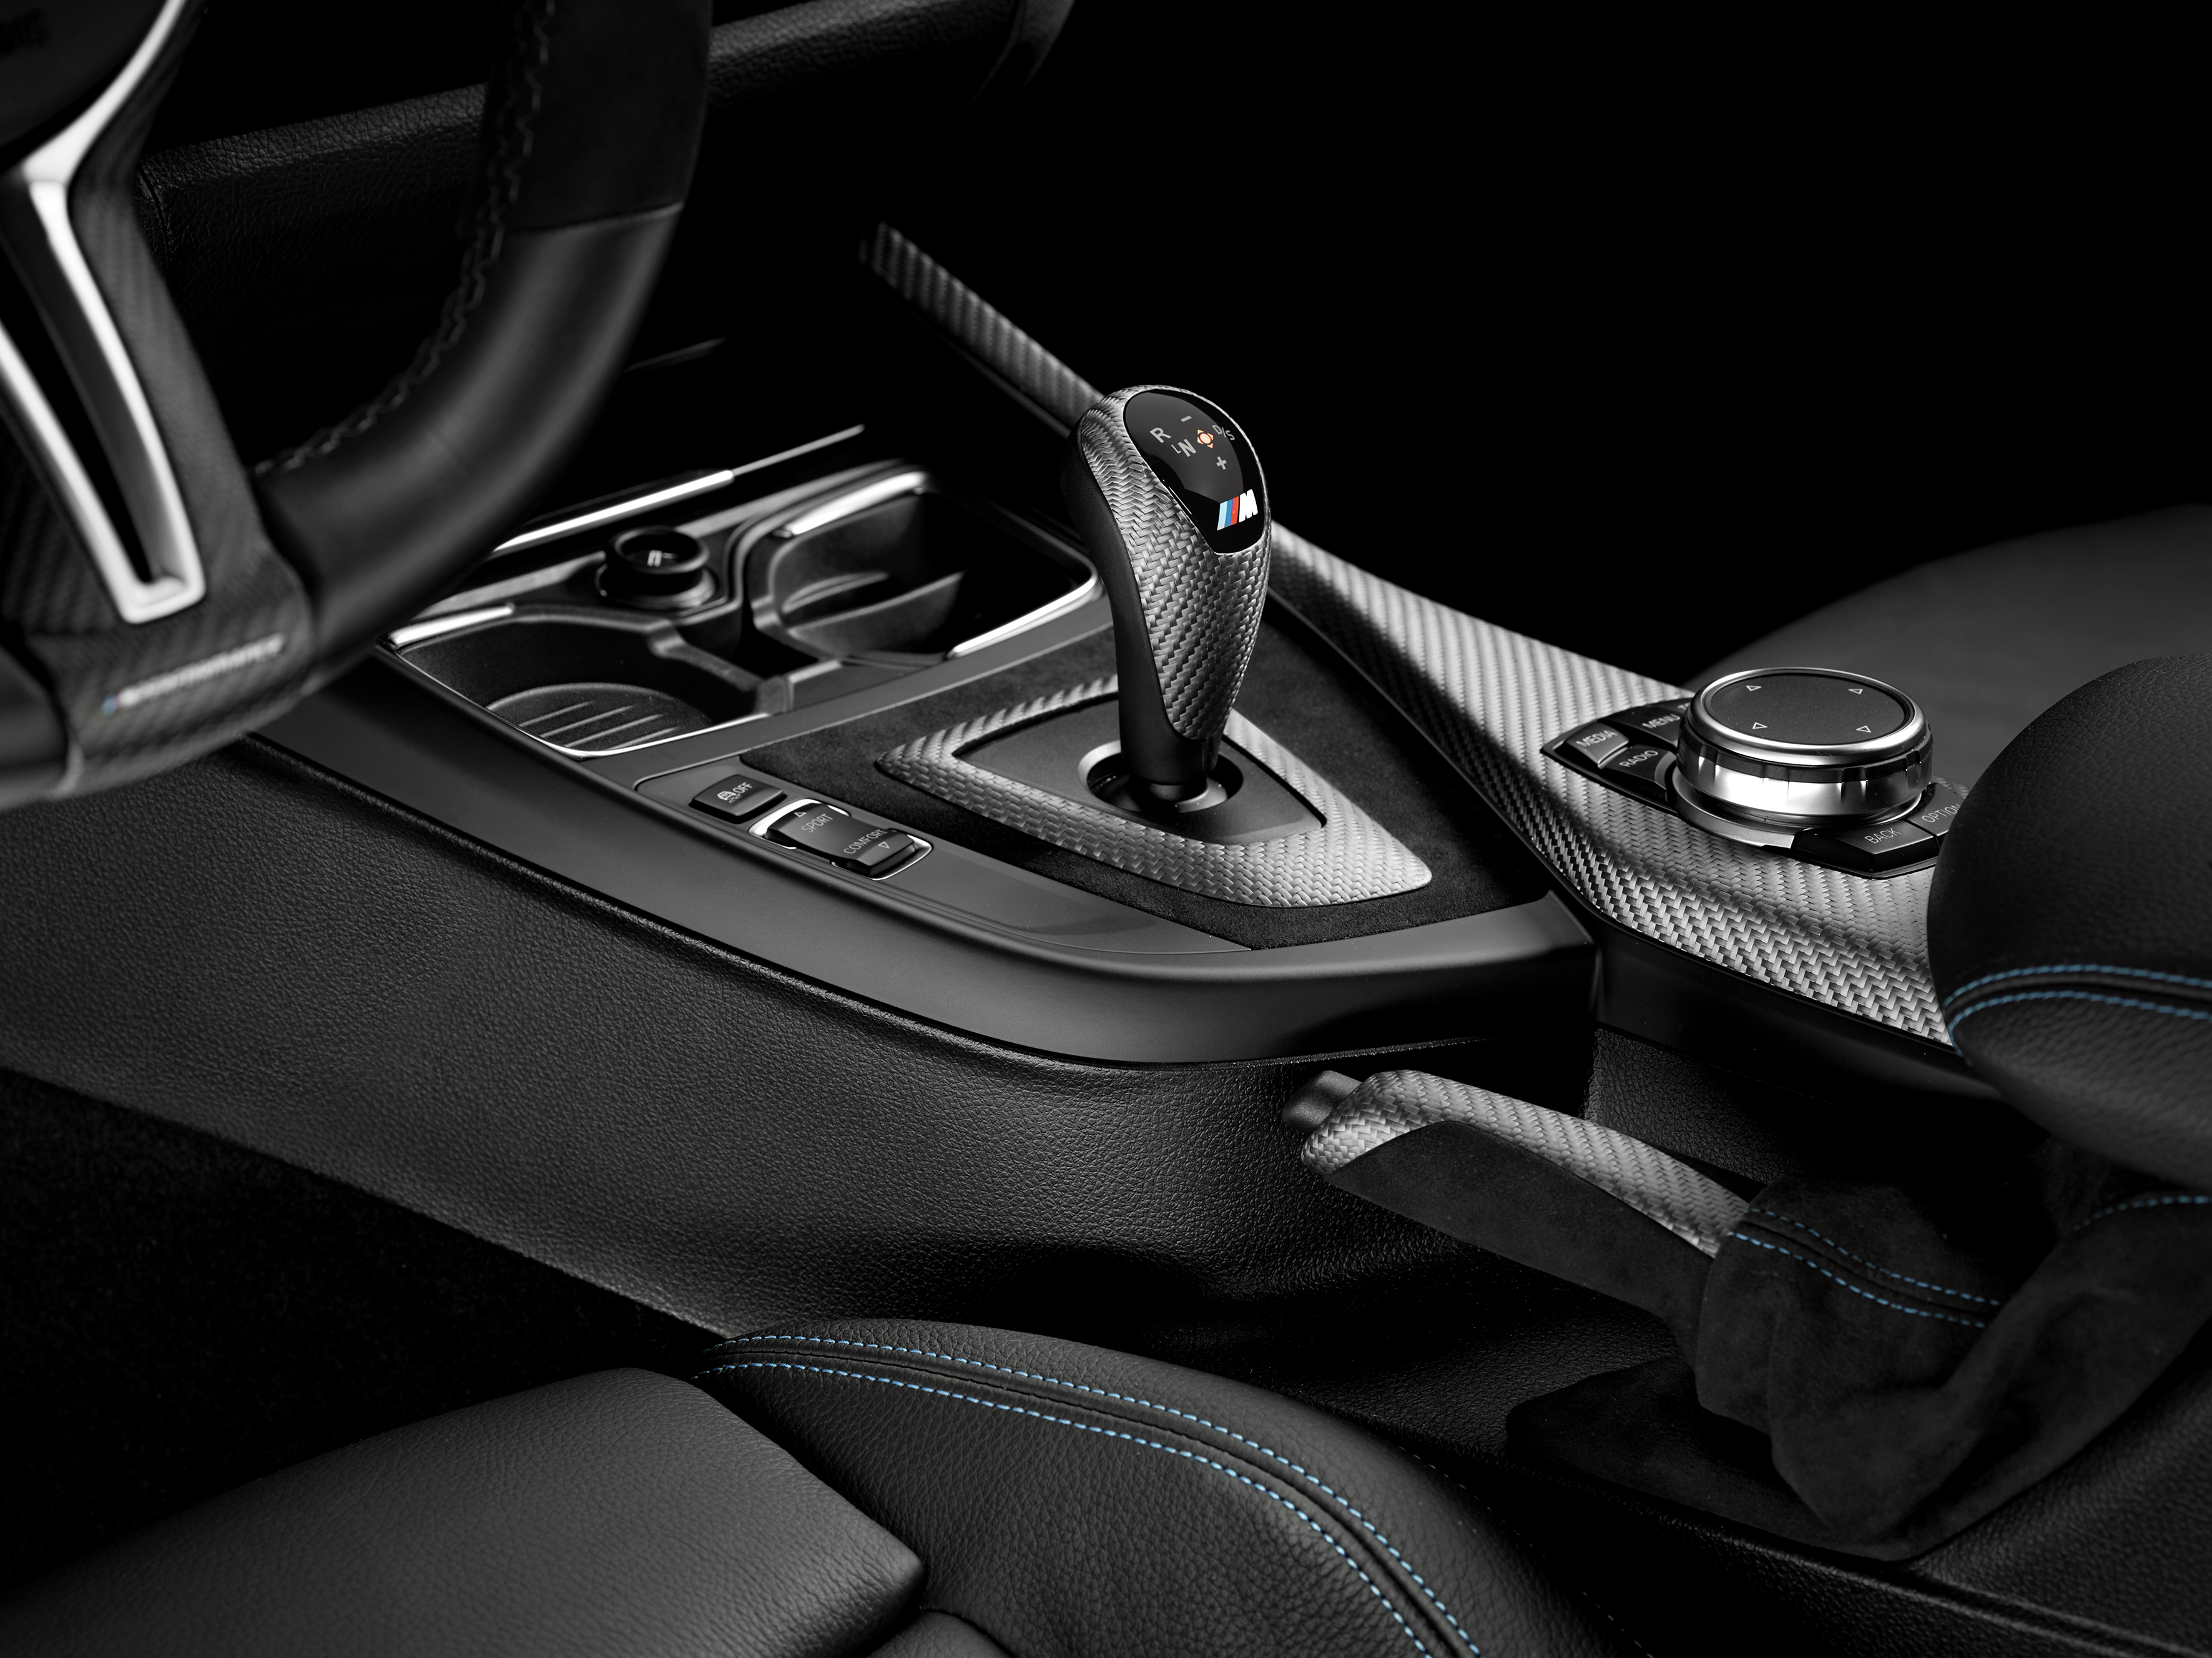 2016-bmw-m2-interior-shift-lever